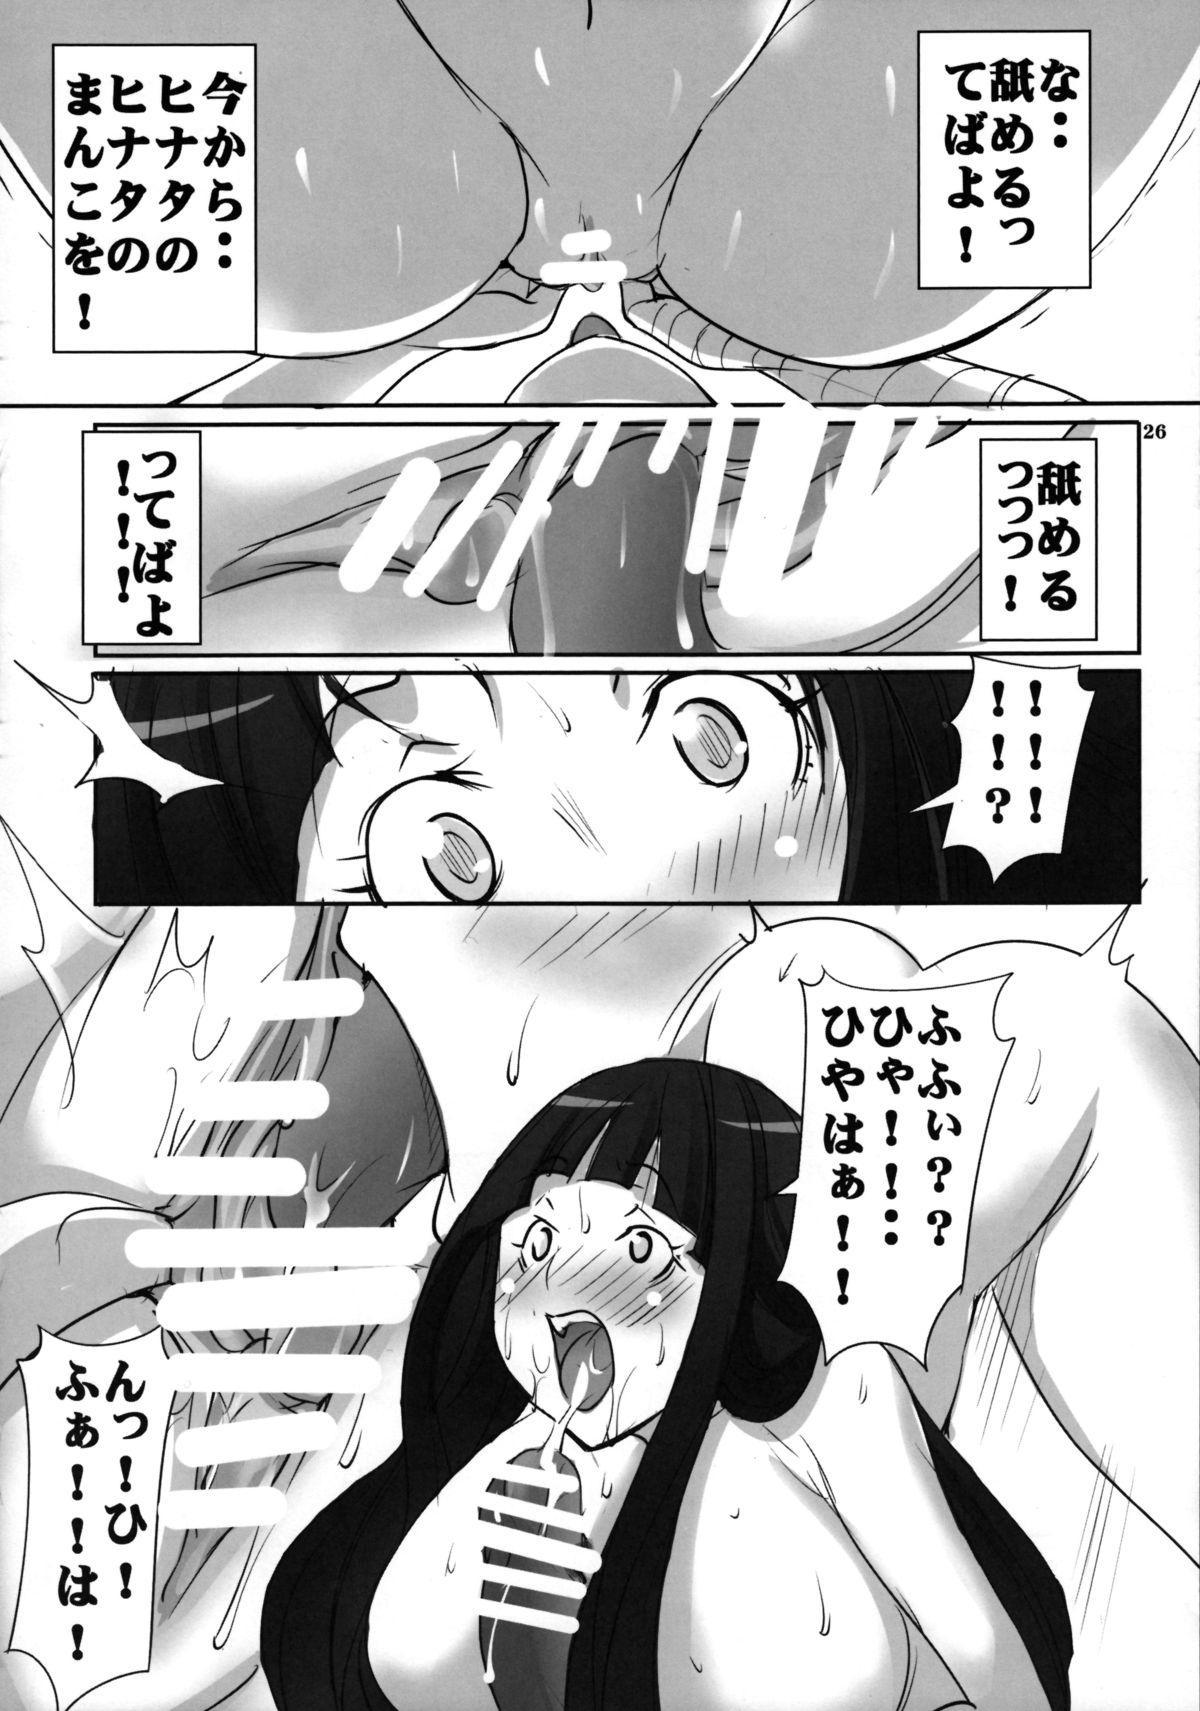 (C89) [Algolagnia (Mikoshiro Honnin)] Naruto [saga] sei (NARUTO) 25